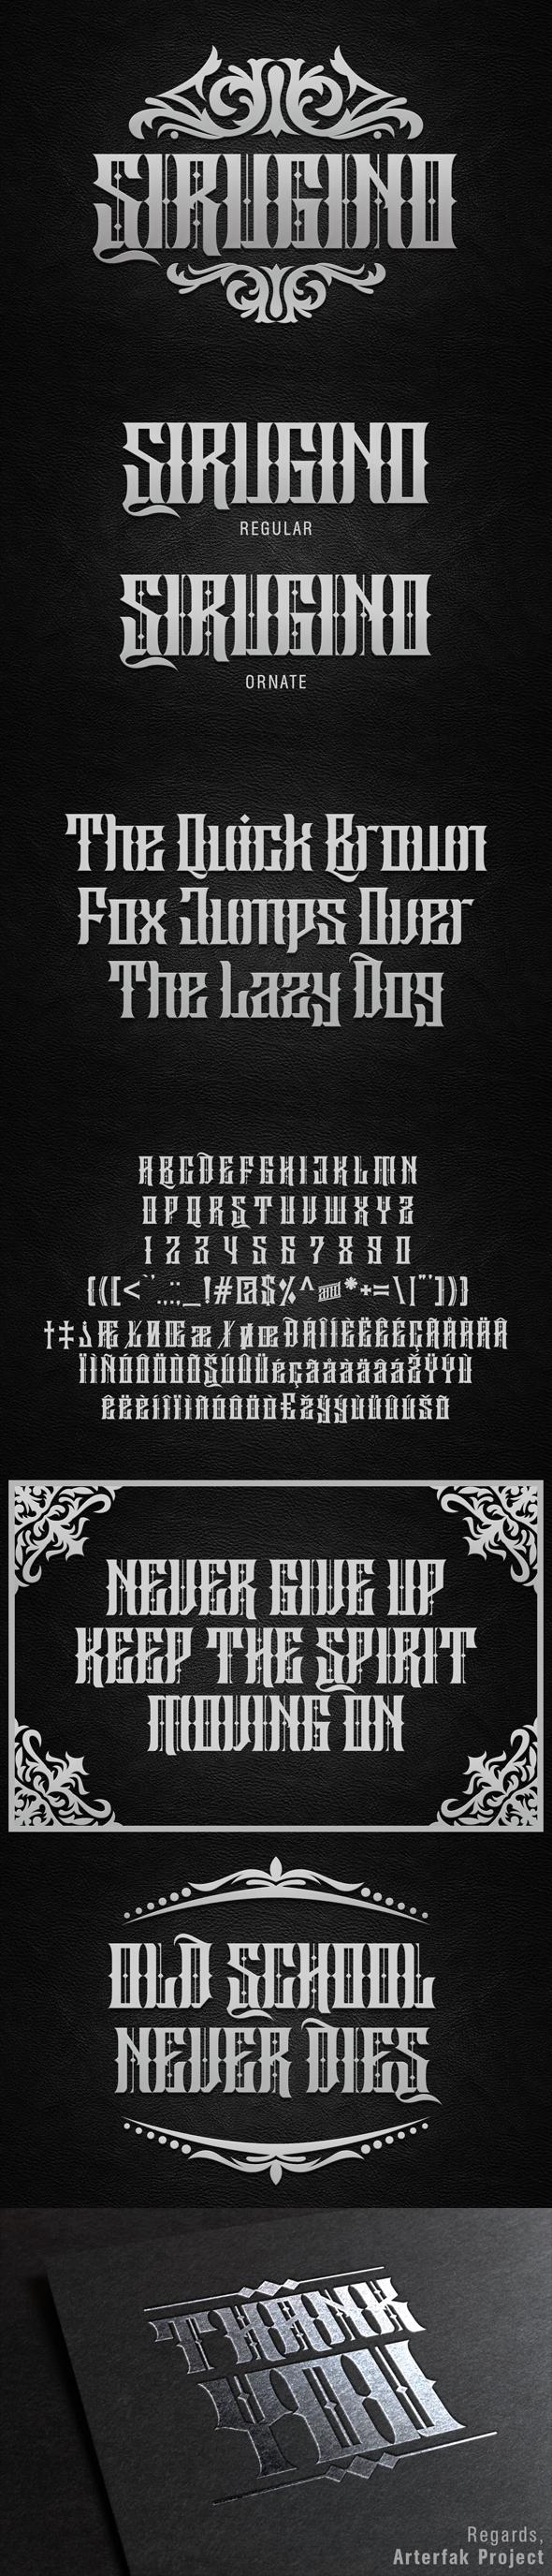 Sirugino Typeface - Gothic Decorative